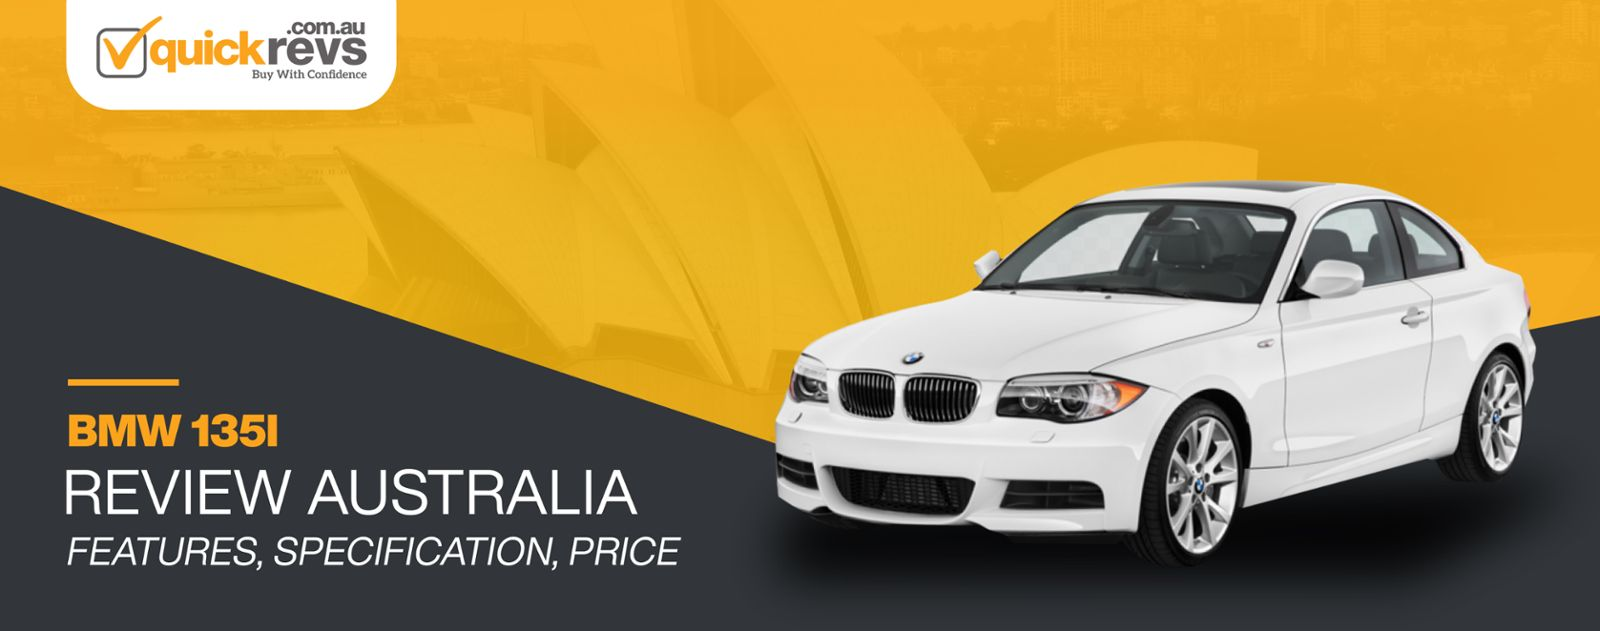 BMW 135i Turbo Review Australia